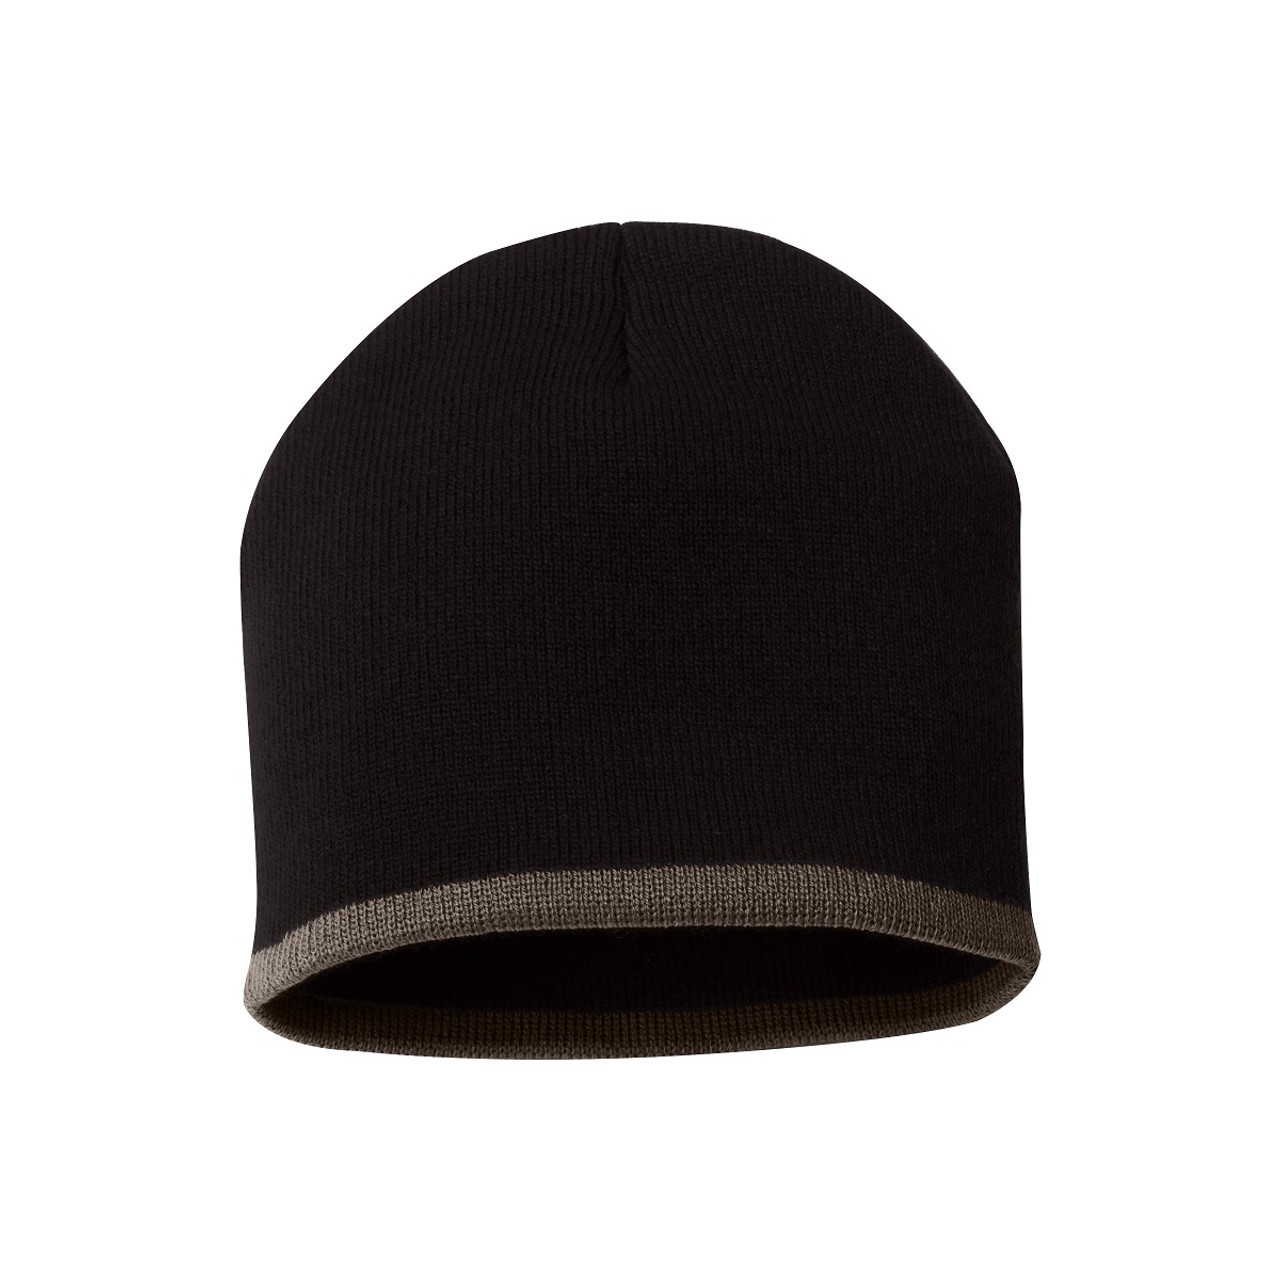 "Black/Taupe - SP09 Sportsman Bottom Stripe Acrylic Knit 8"" Toque | T-shirt.ca"